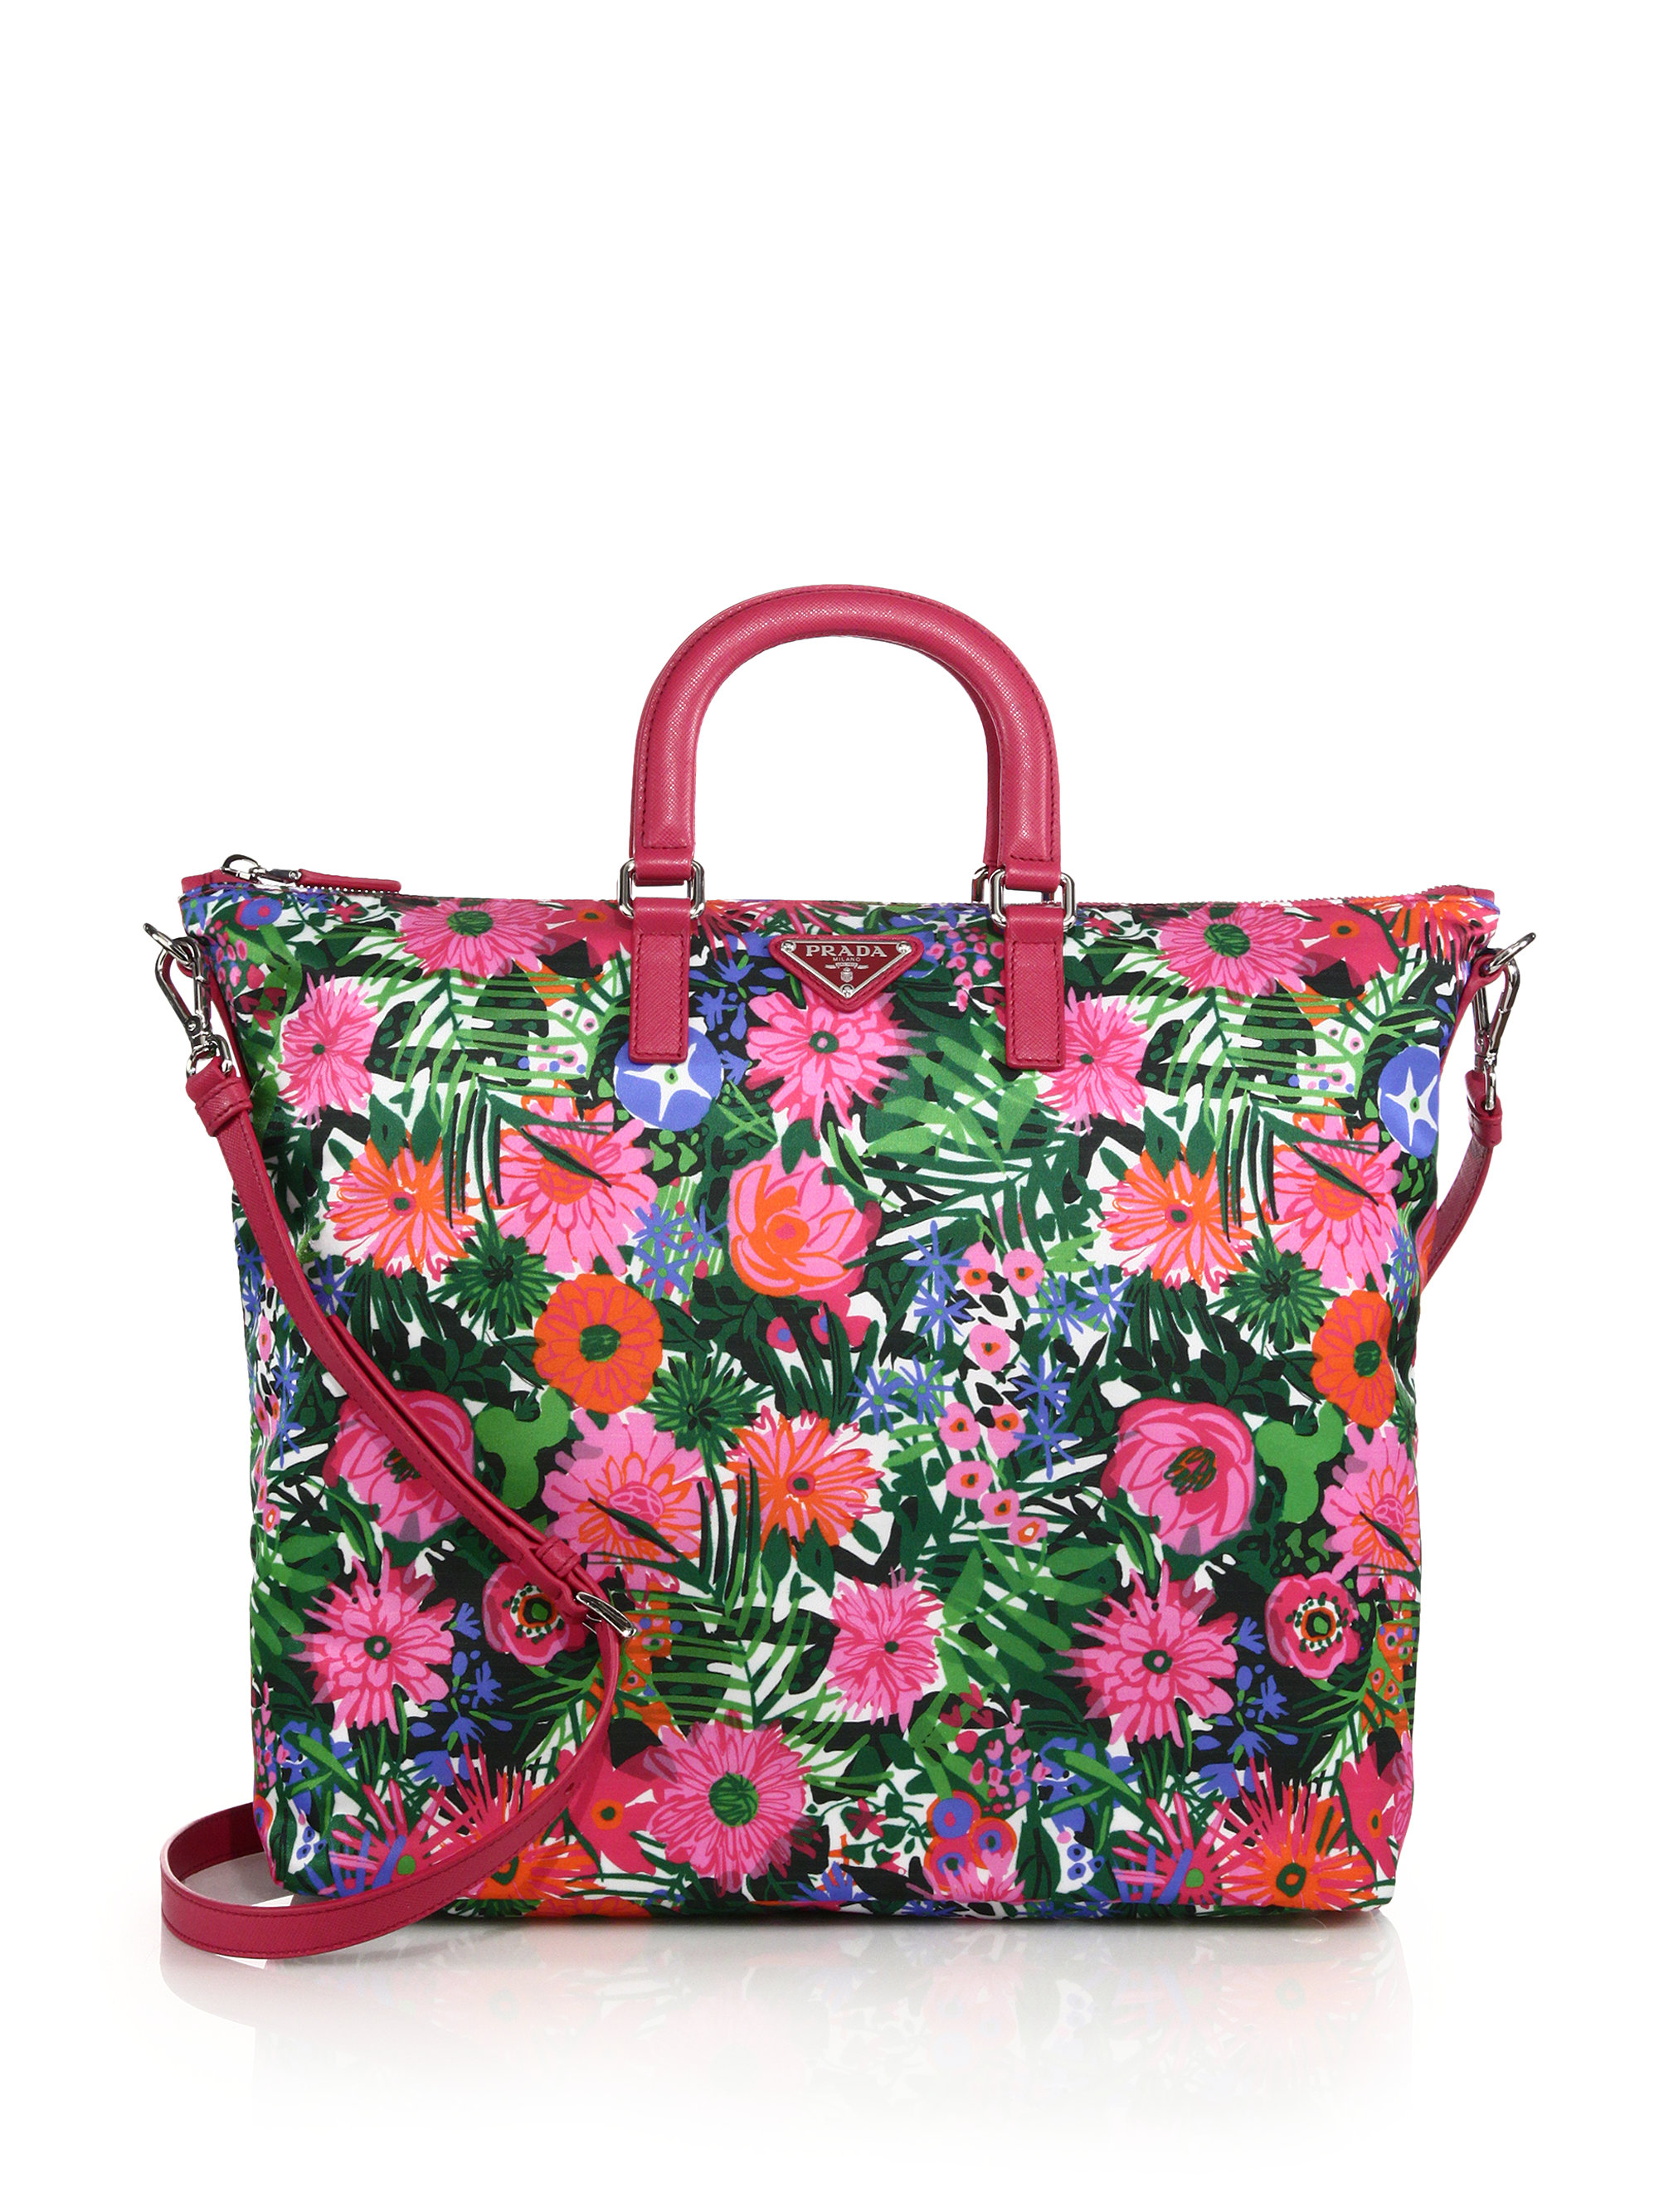 3b0f35d839ae Prada Floral-Print Nylon Tote - Lyst